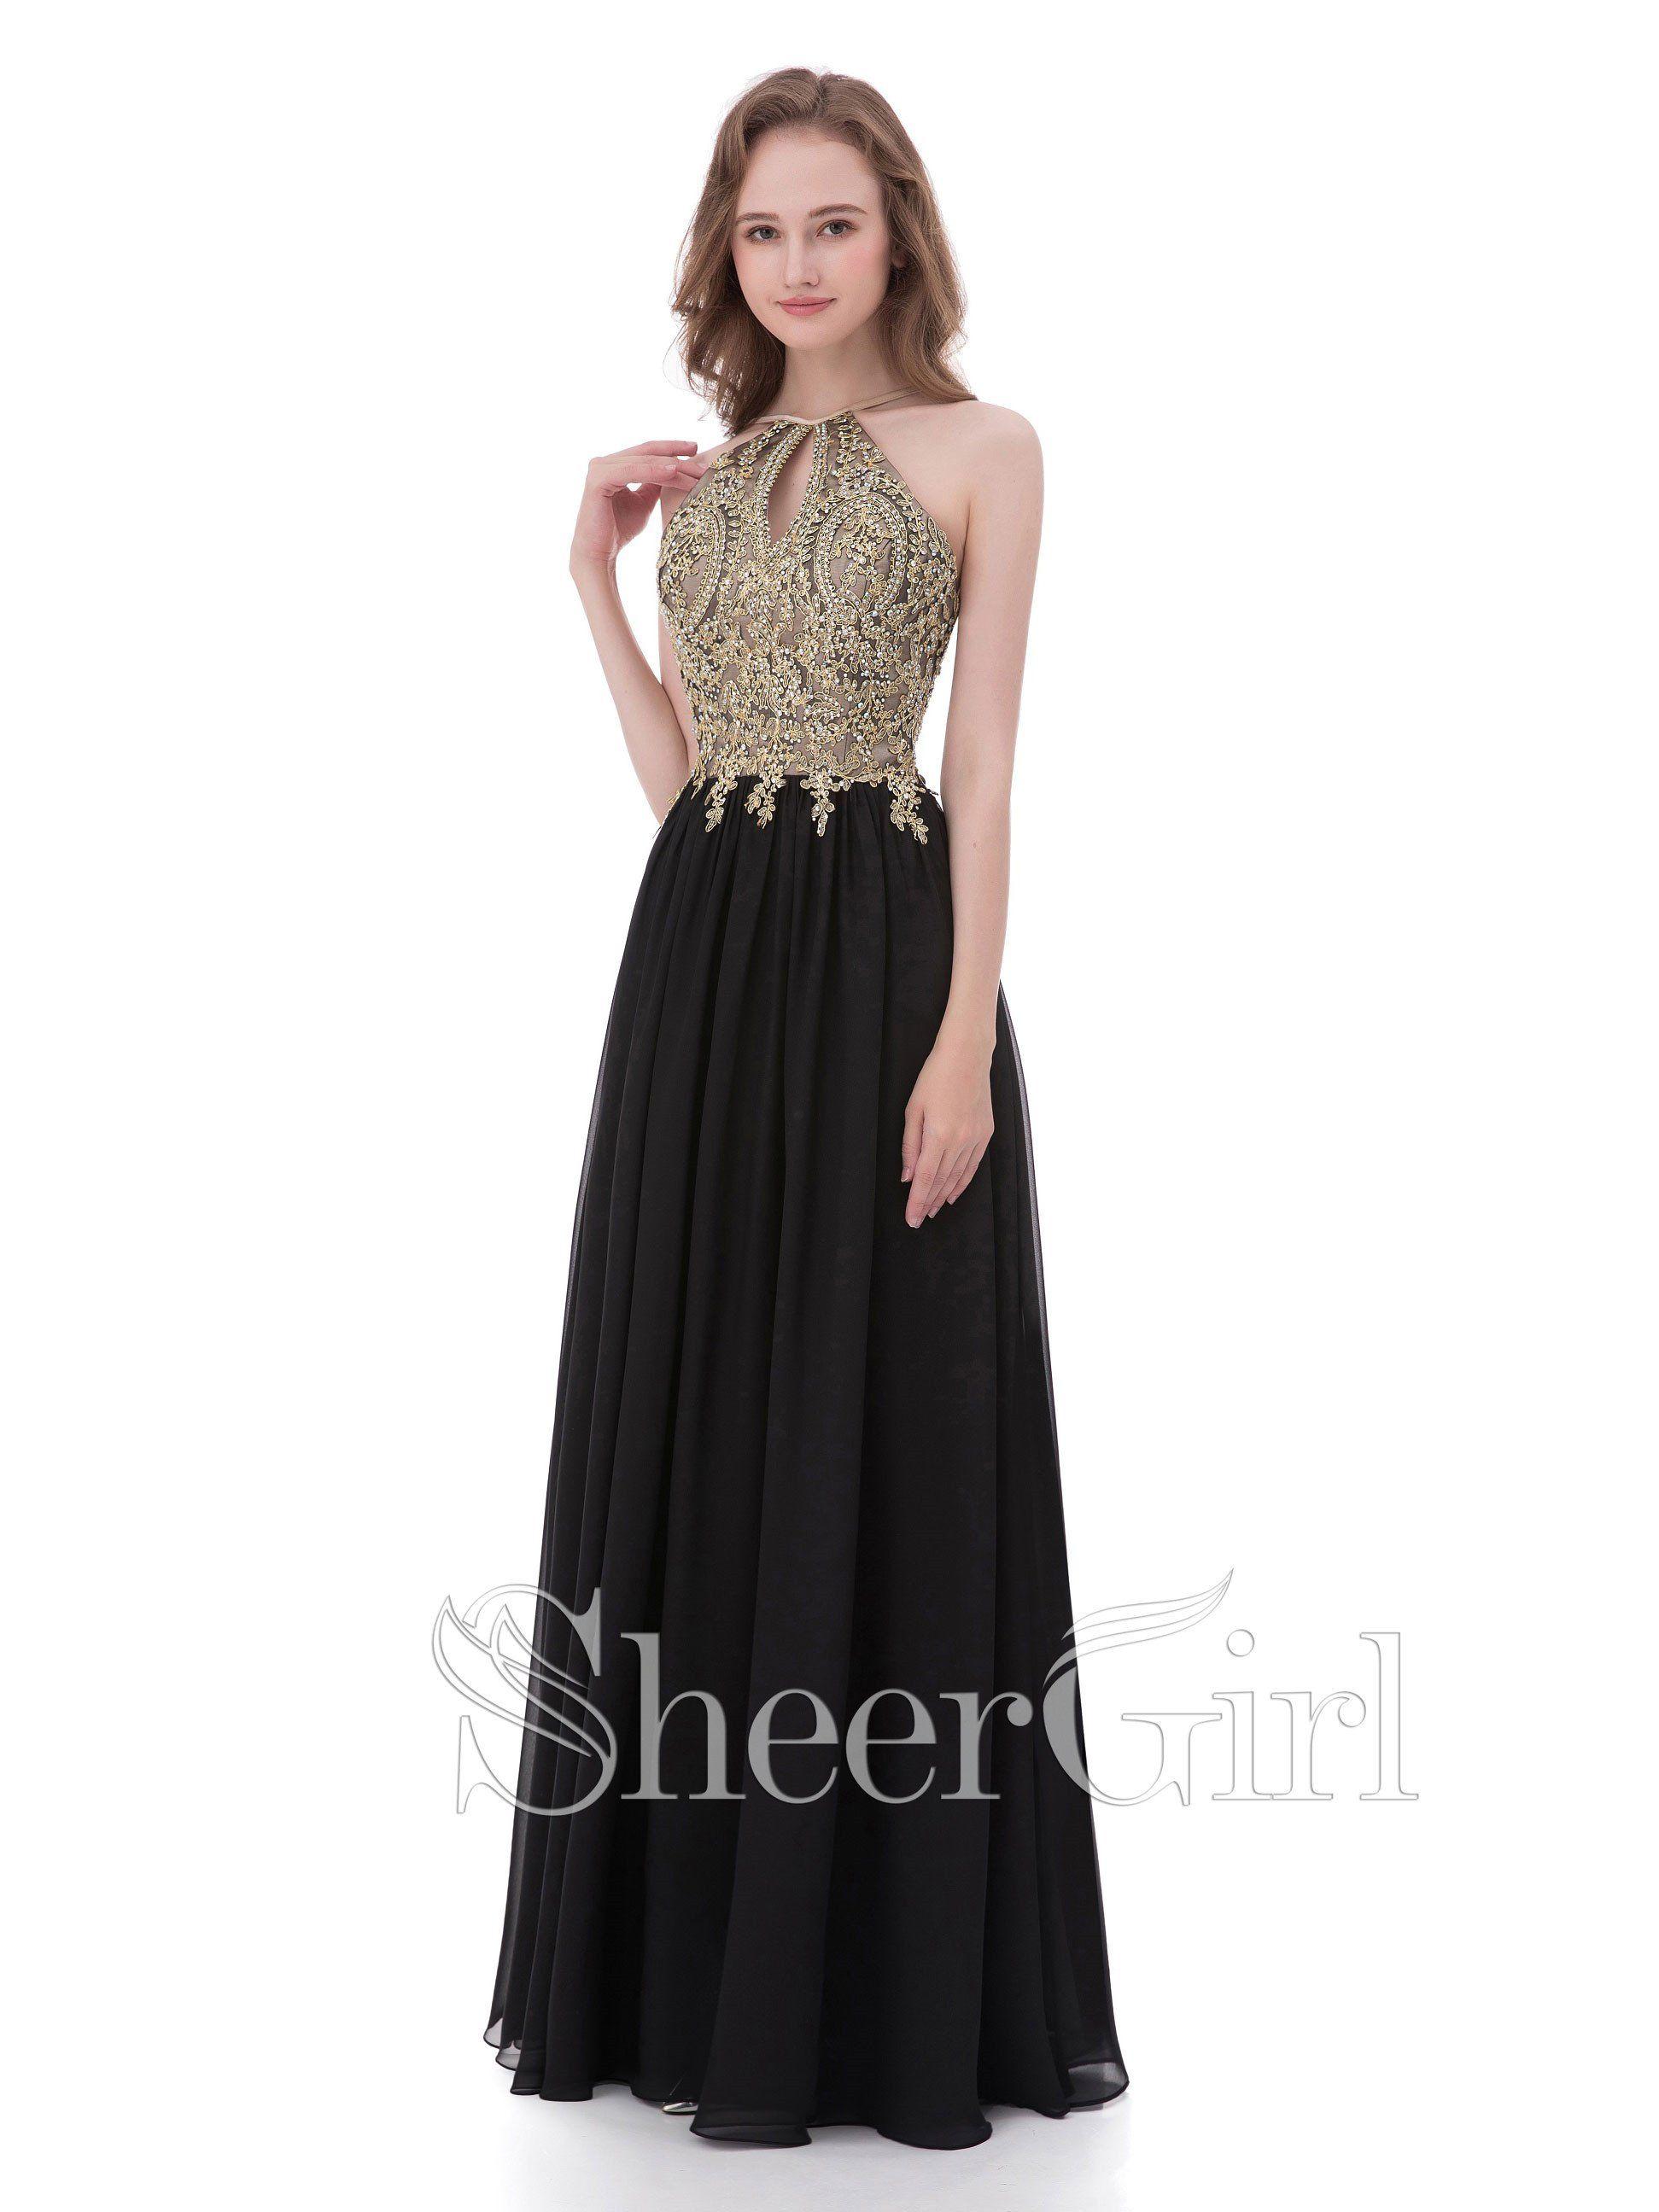 Aline Gold Lace Appliqued Black Chiffon Halter Long Prom Dresses